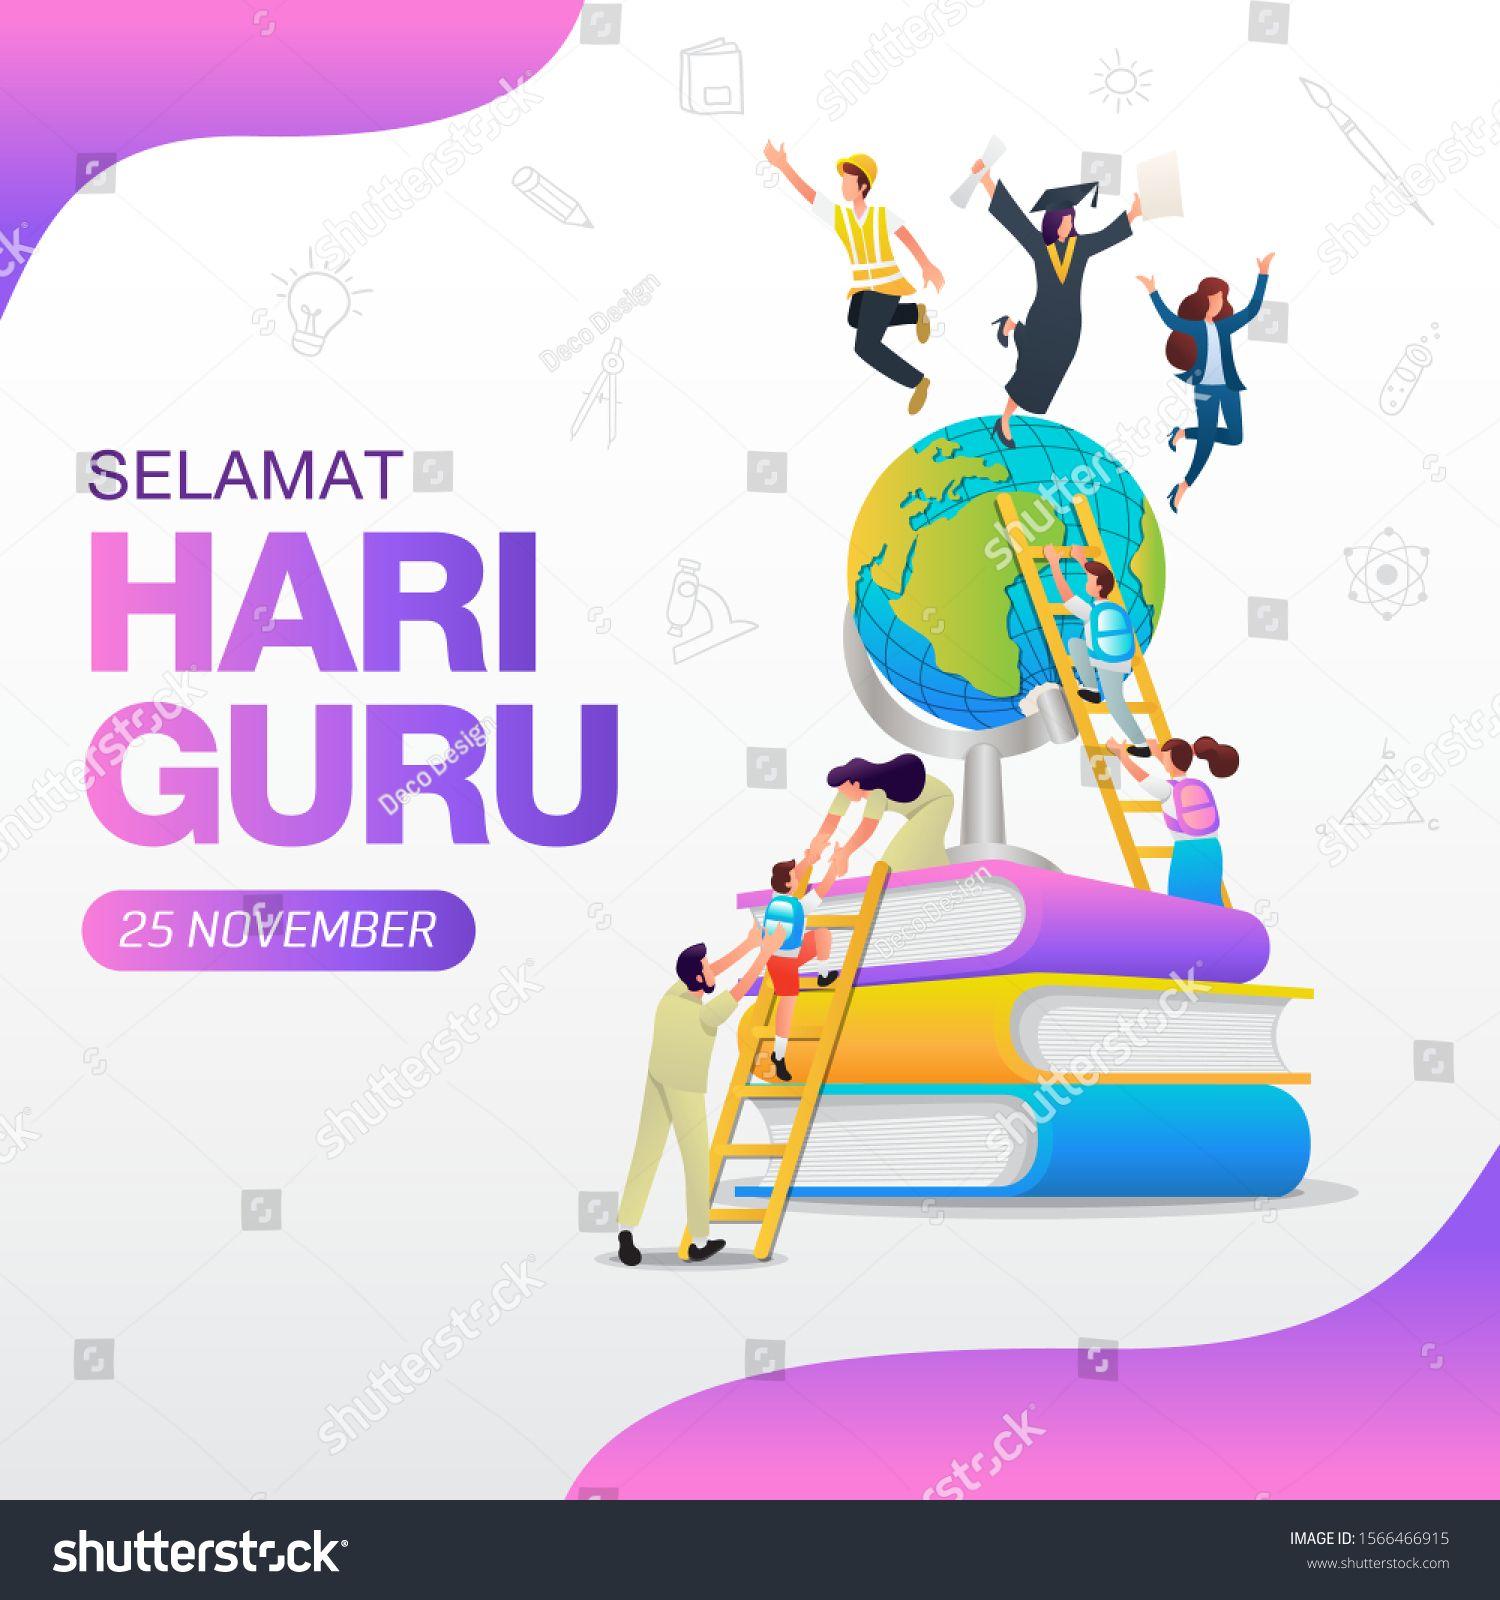 Selamat Hari Guru Translation Happy Teacher S Day Indonesian Holiday Teacher S Day Illustration Suitable For Greeti In 2020 Happy Teachers Day Teachers Day Banner